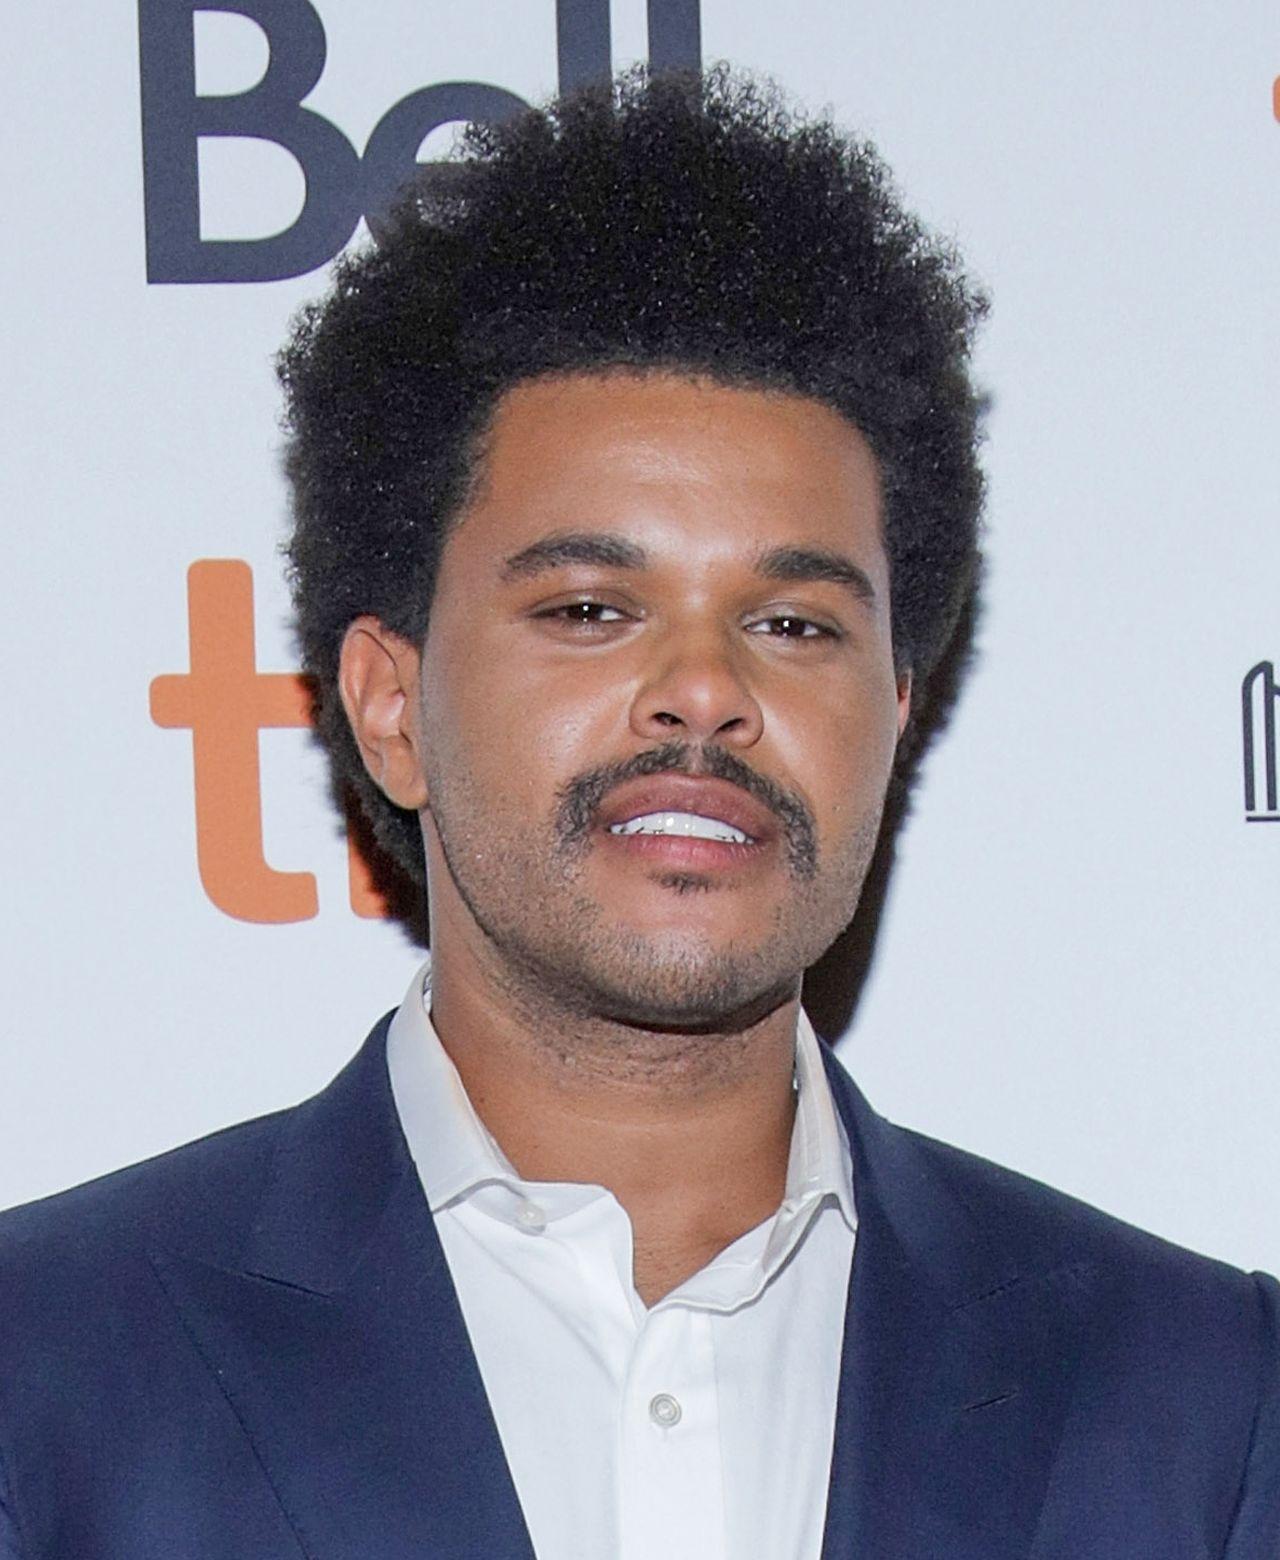 The Weeknd na ściance.